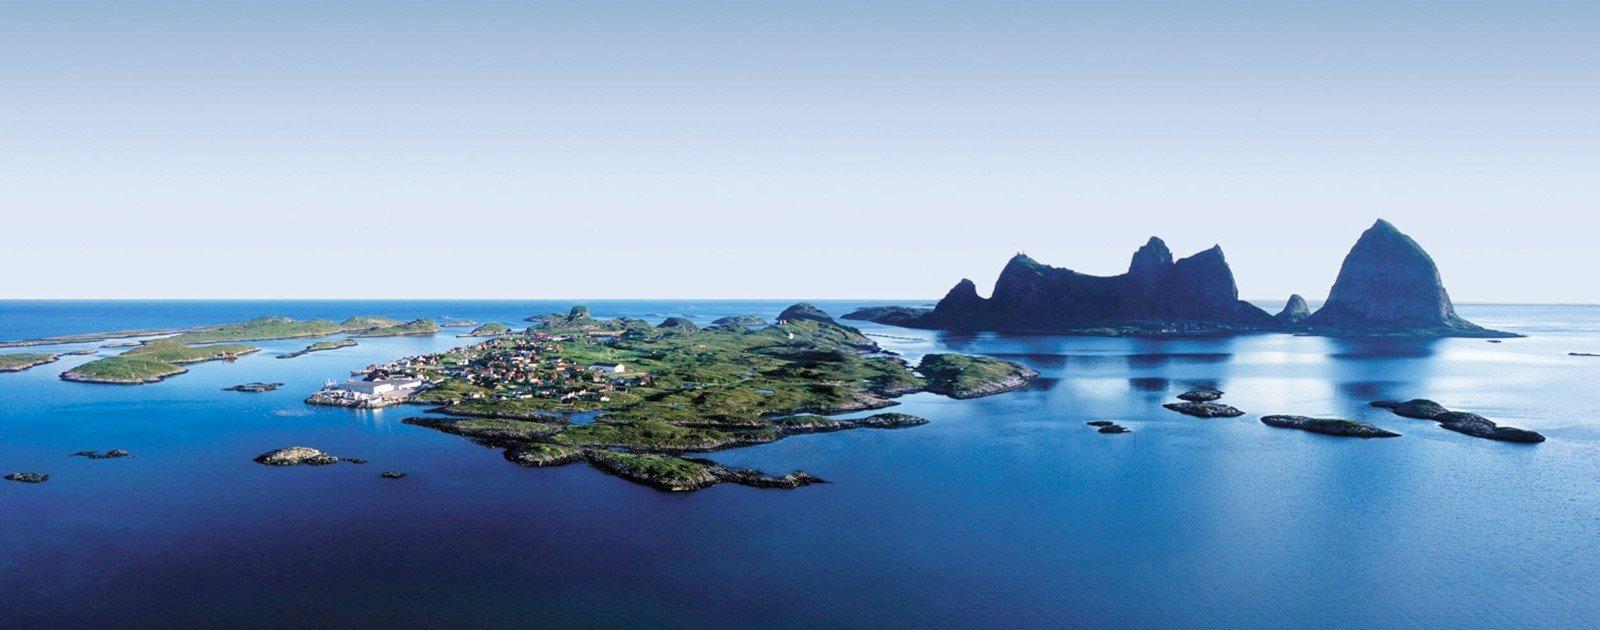 TRAENA OVERNATTING - Prices & Hostel Reviews (Traena Municipality, Norway) - Tripadvisor